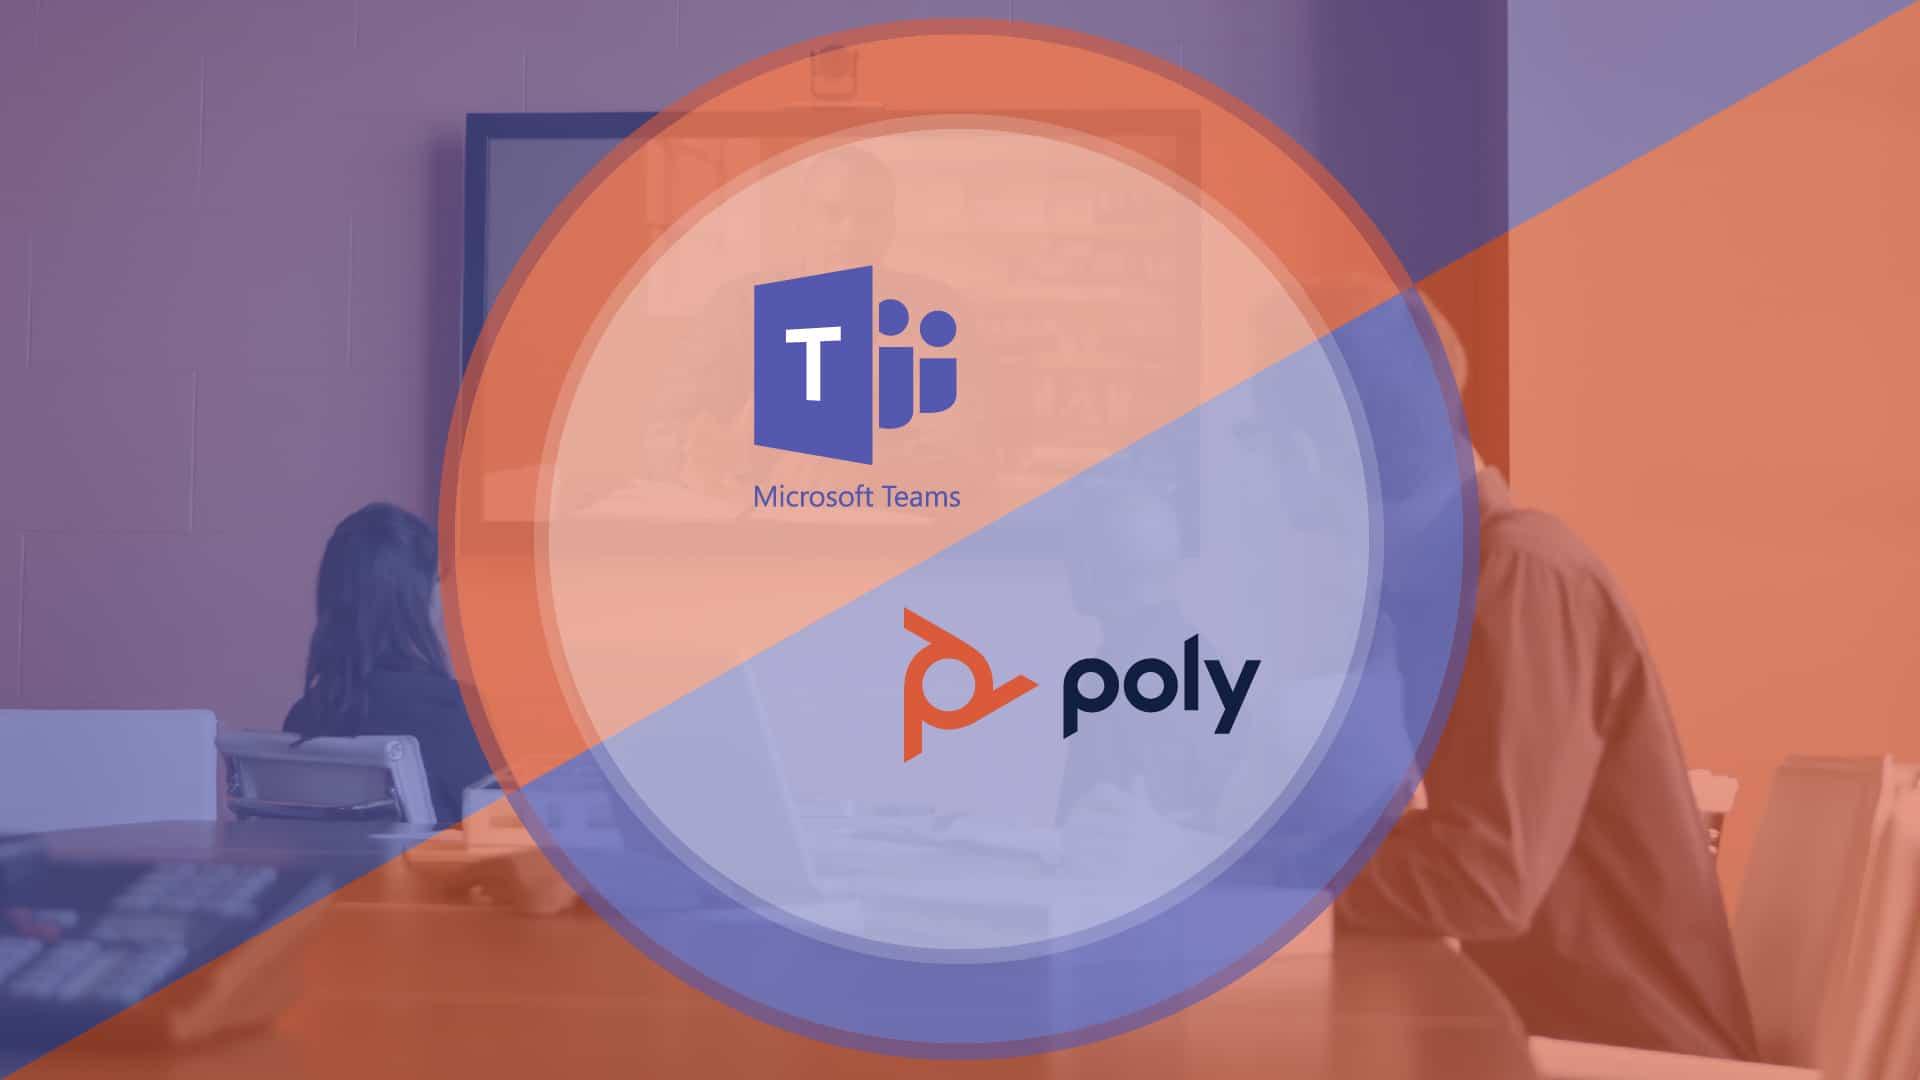 Microsoft Teams & Poly